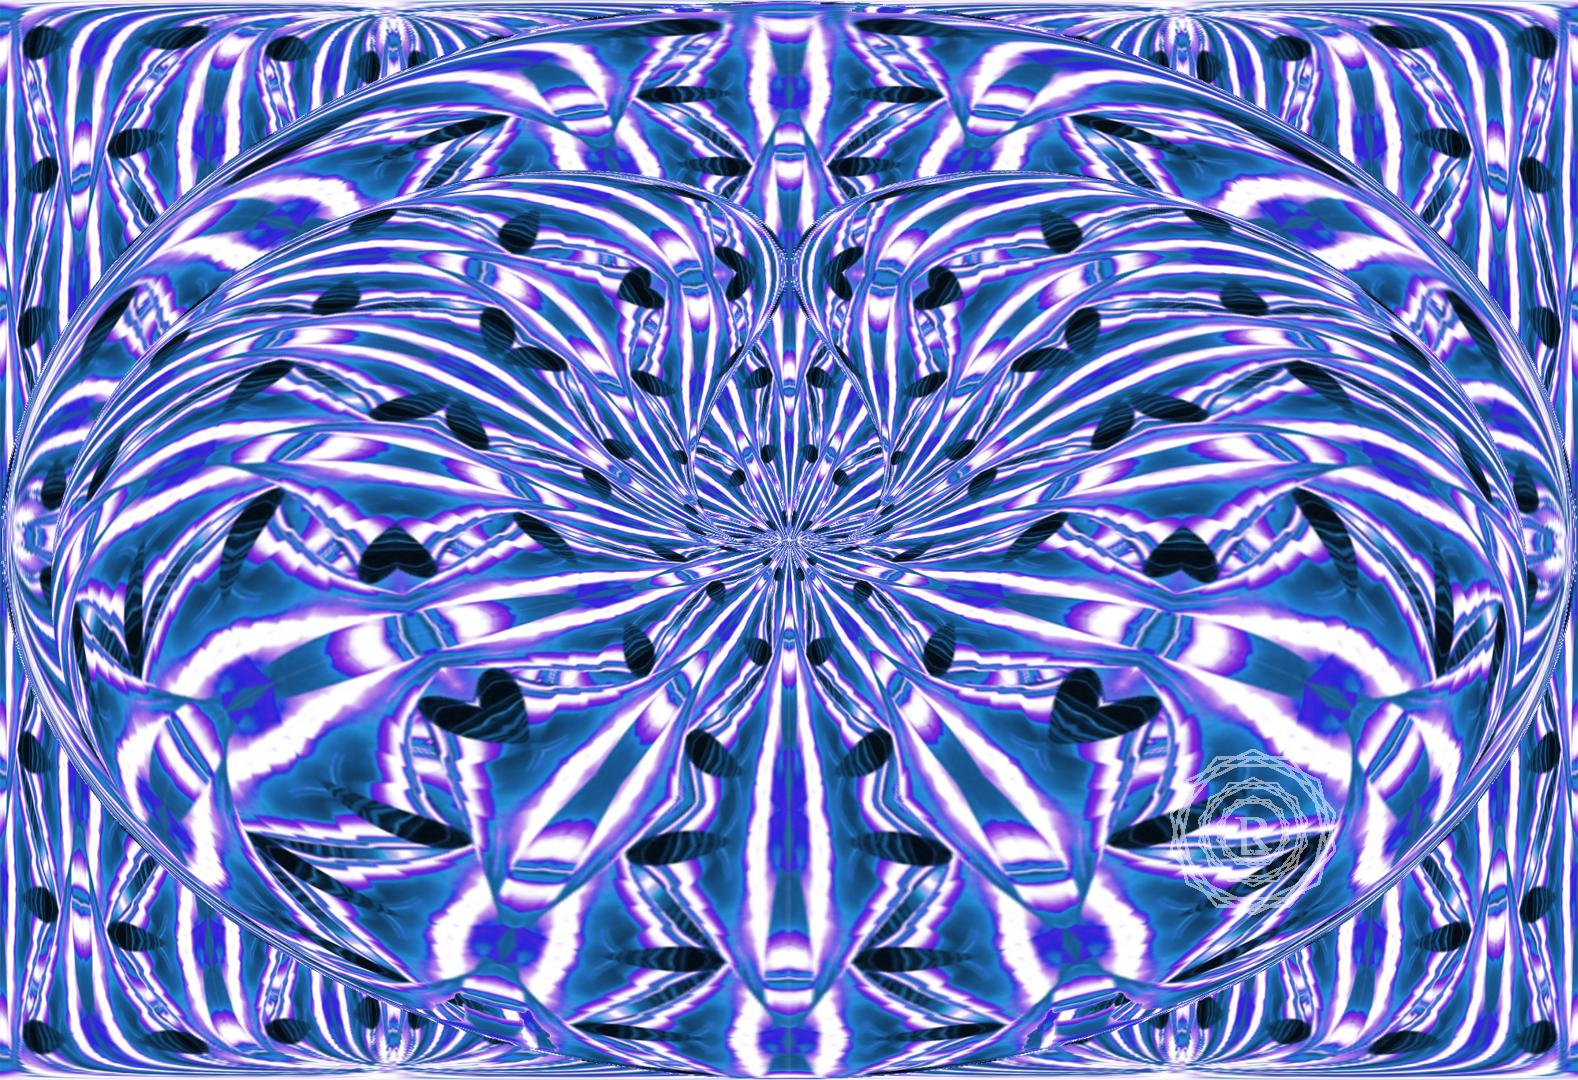 00025Resized_Mandalas_copyright_Recursia